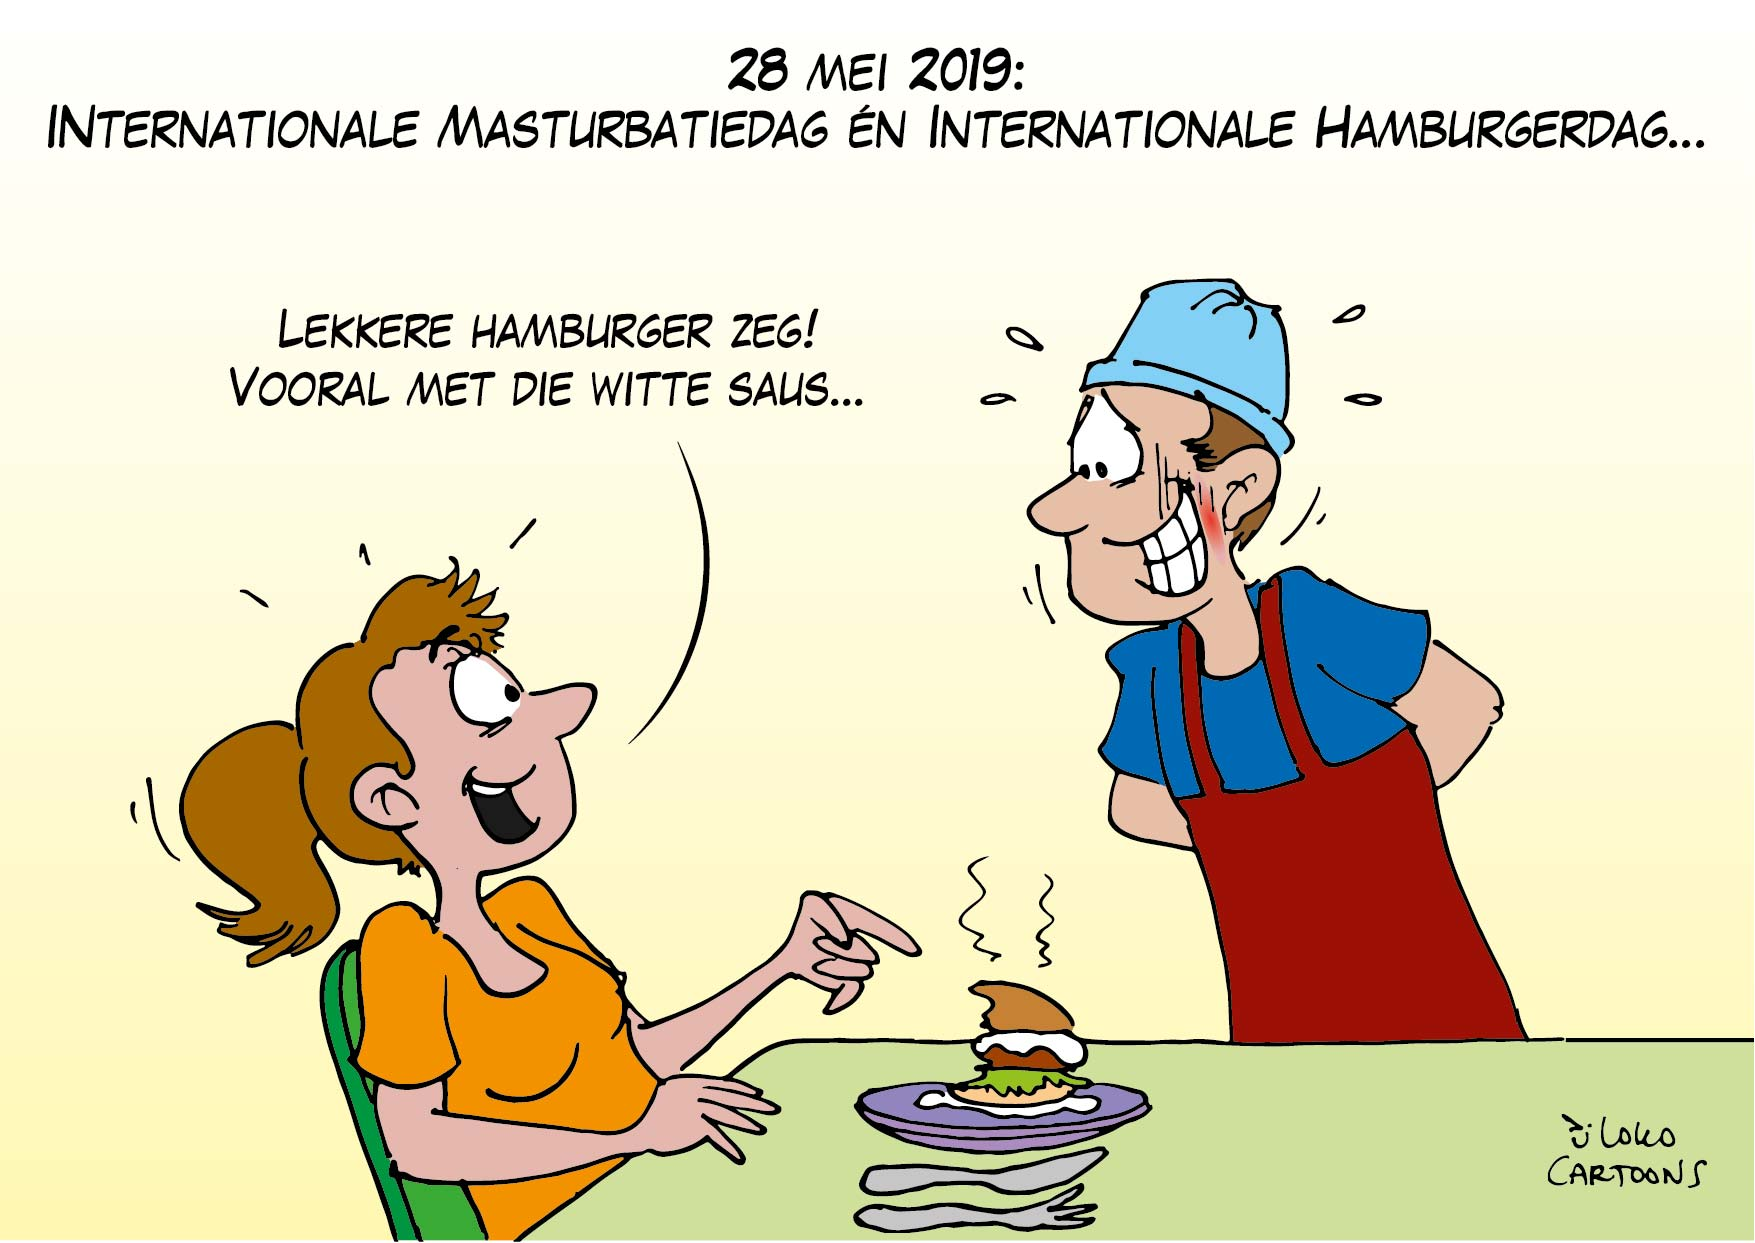 Internationale Masturbatiedag en Internationale Hamburgerdag…